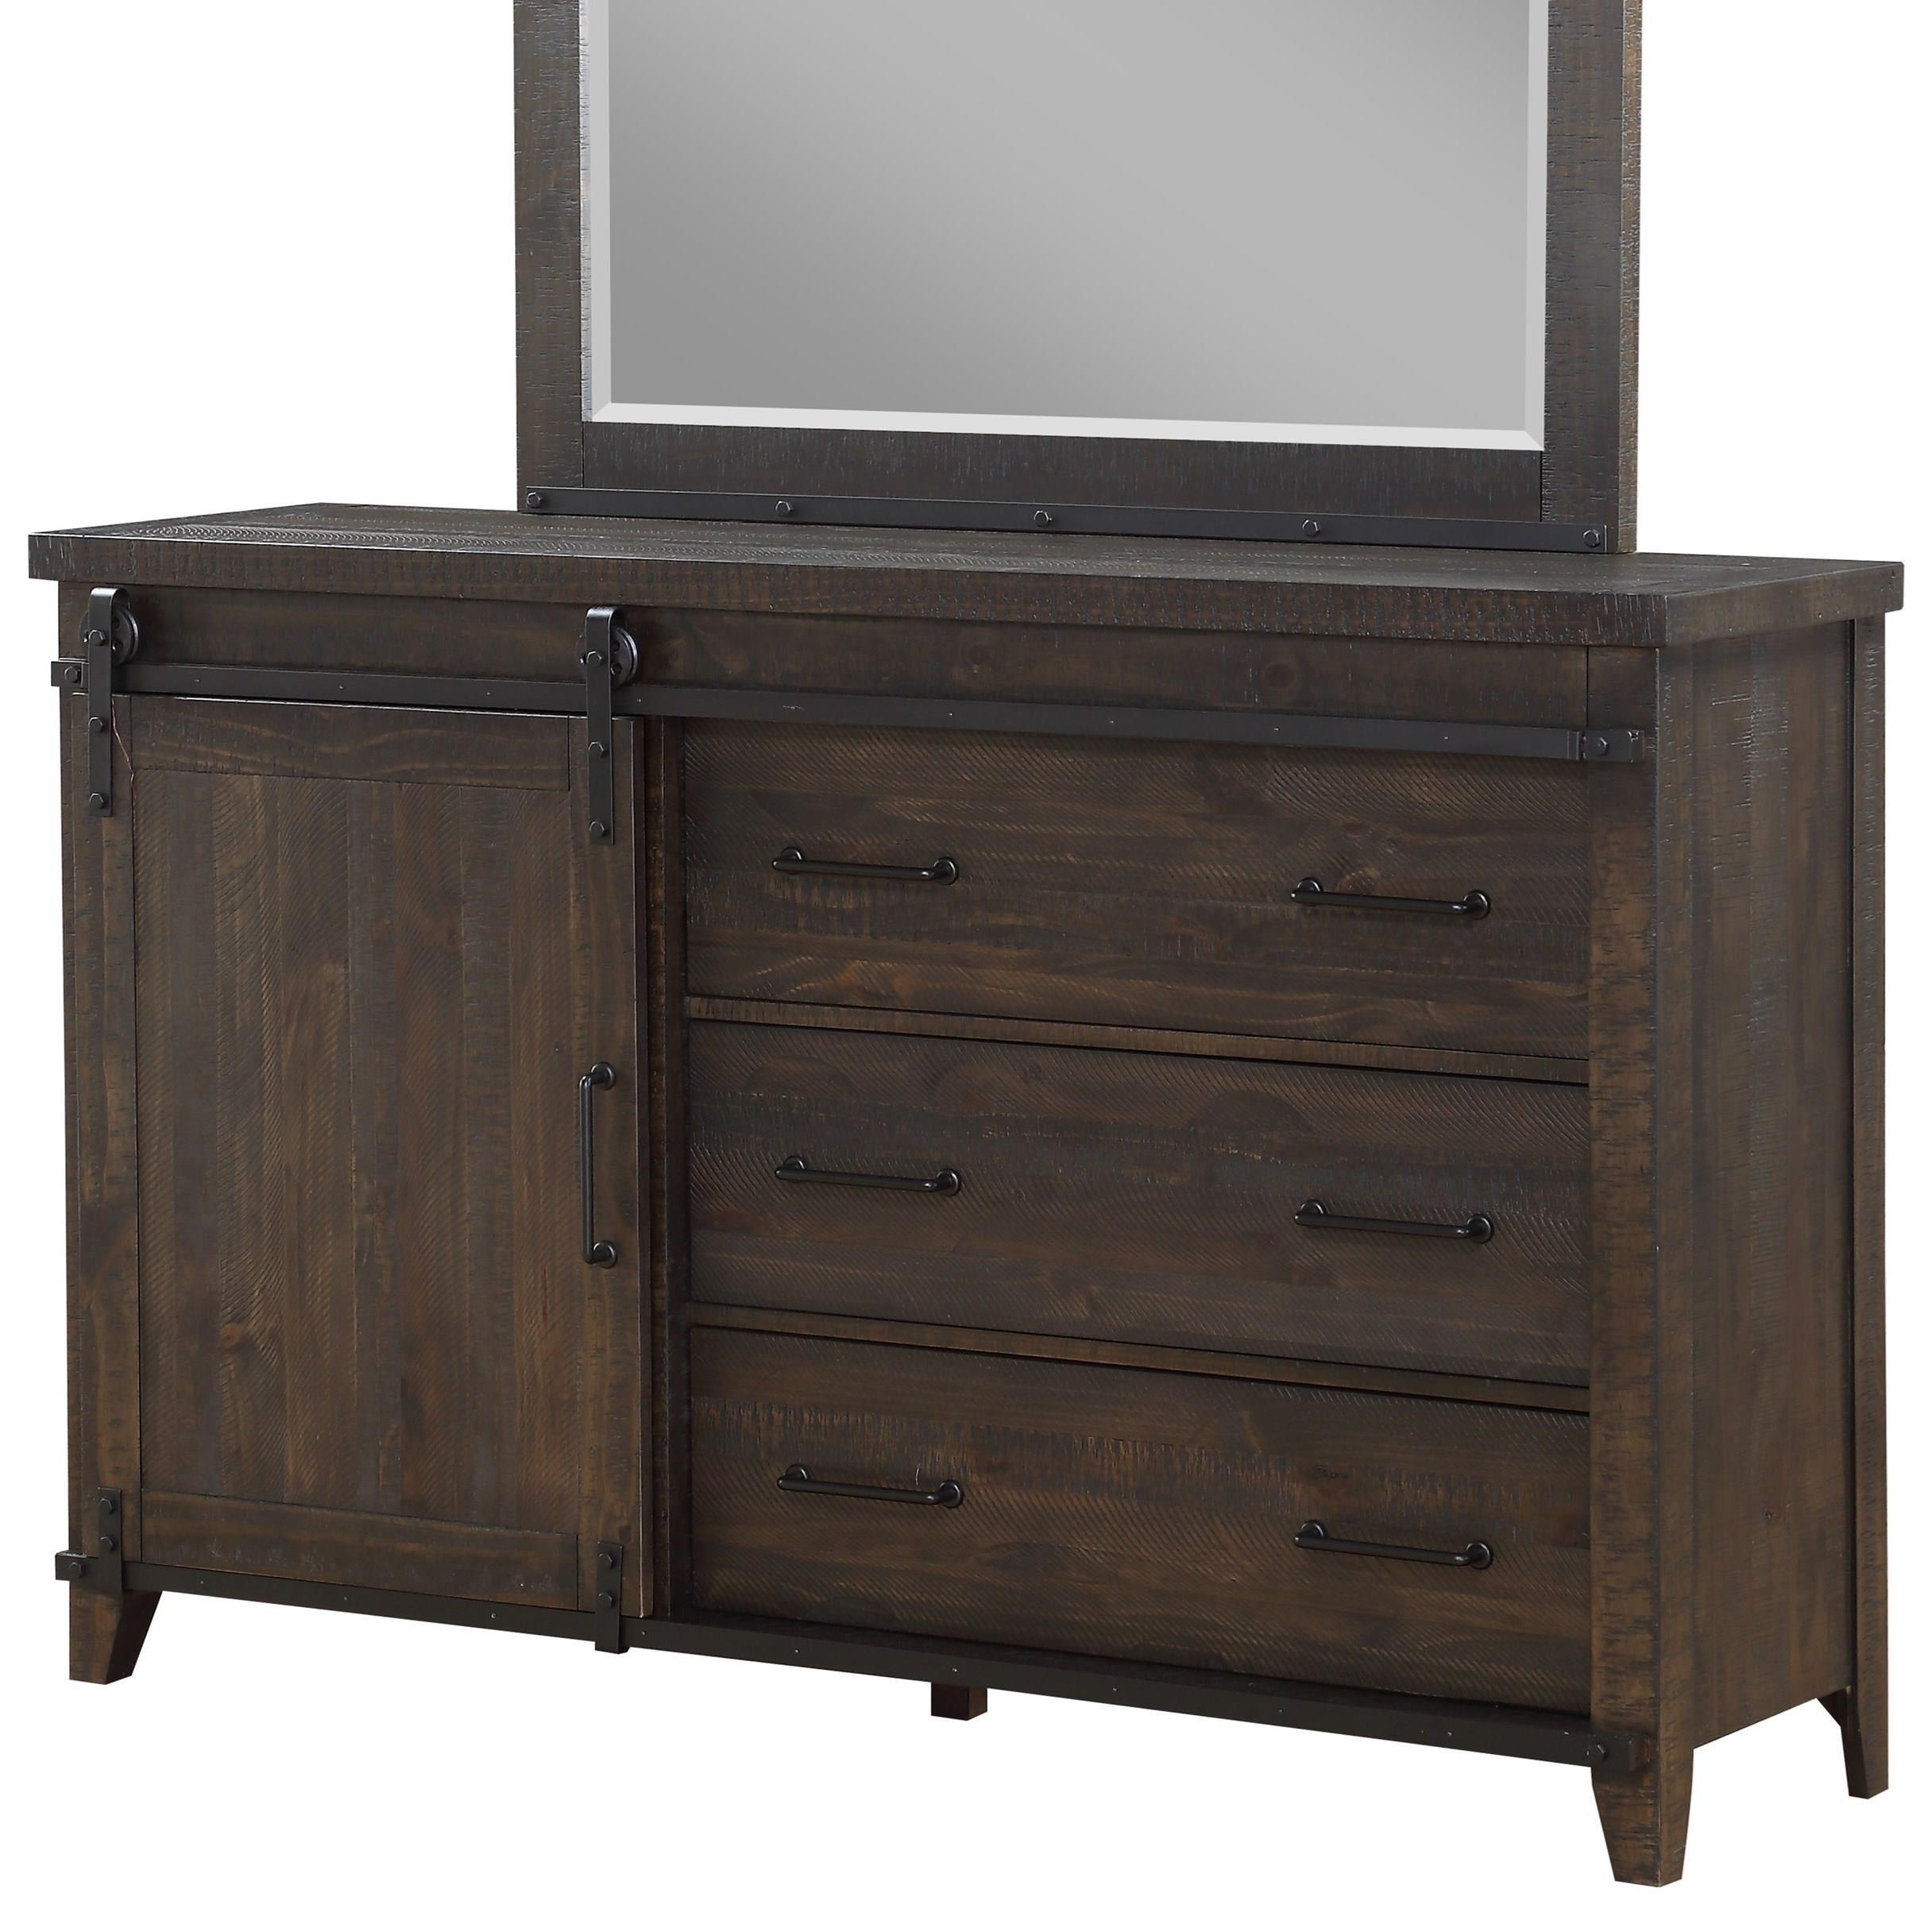 Outstanding Holland House Montana 2622 03 Drawer Dresser With Barn Door Download Free Architecture Designs Rallybritishbridgeorg